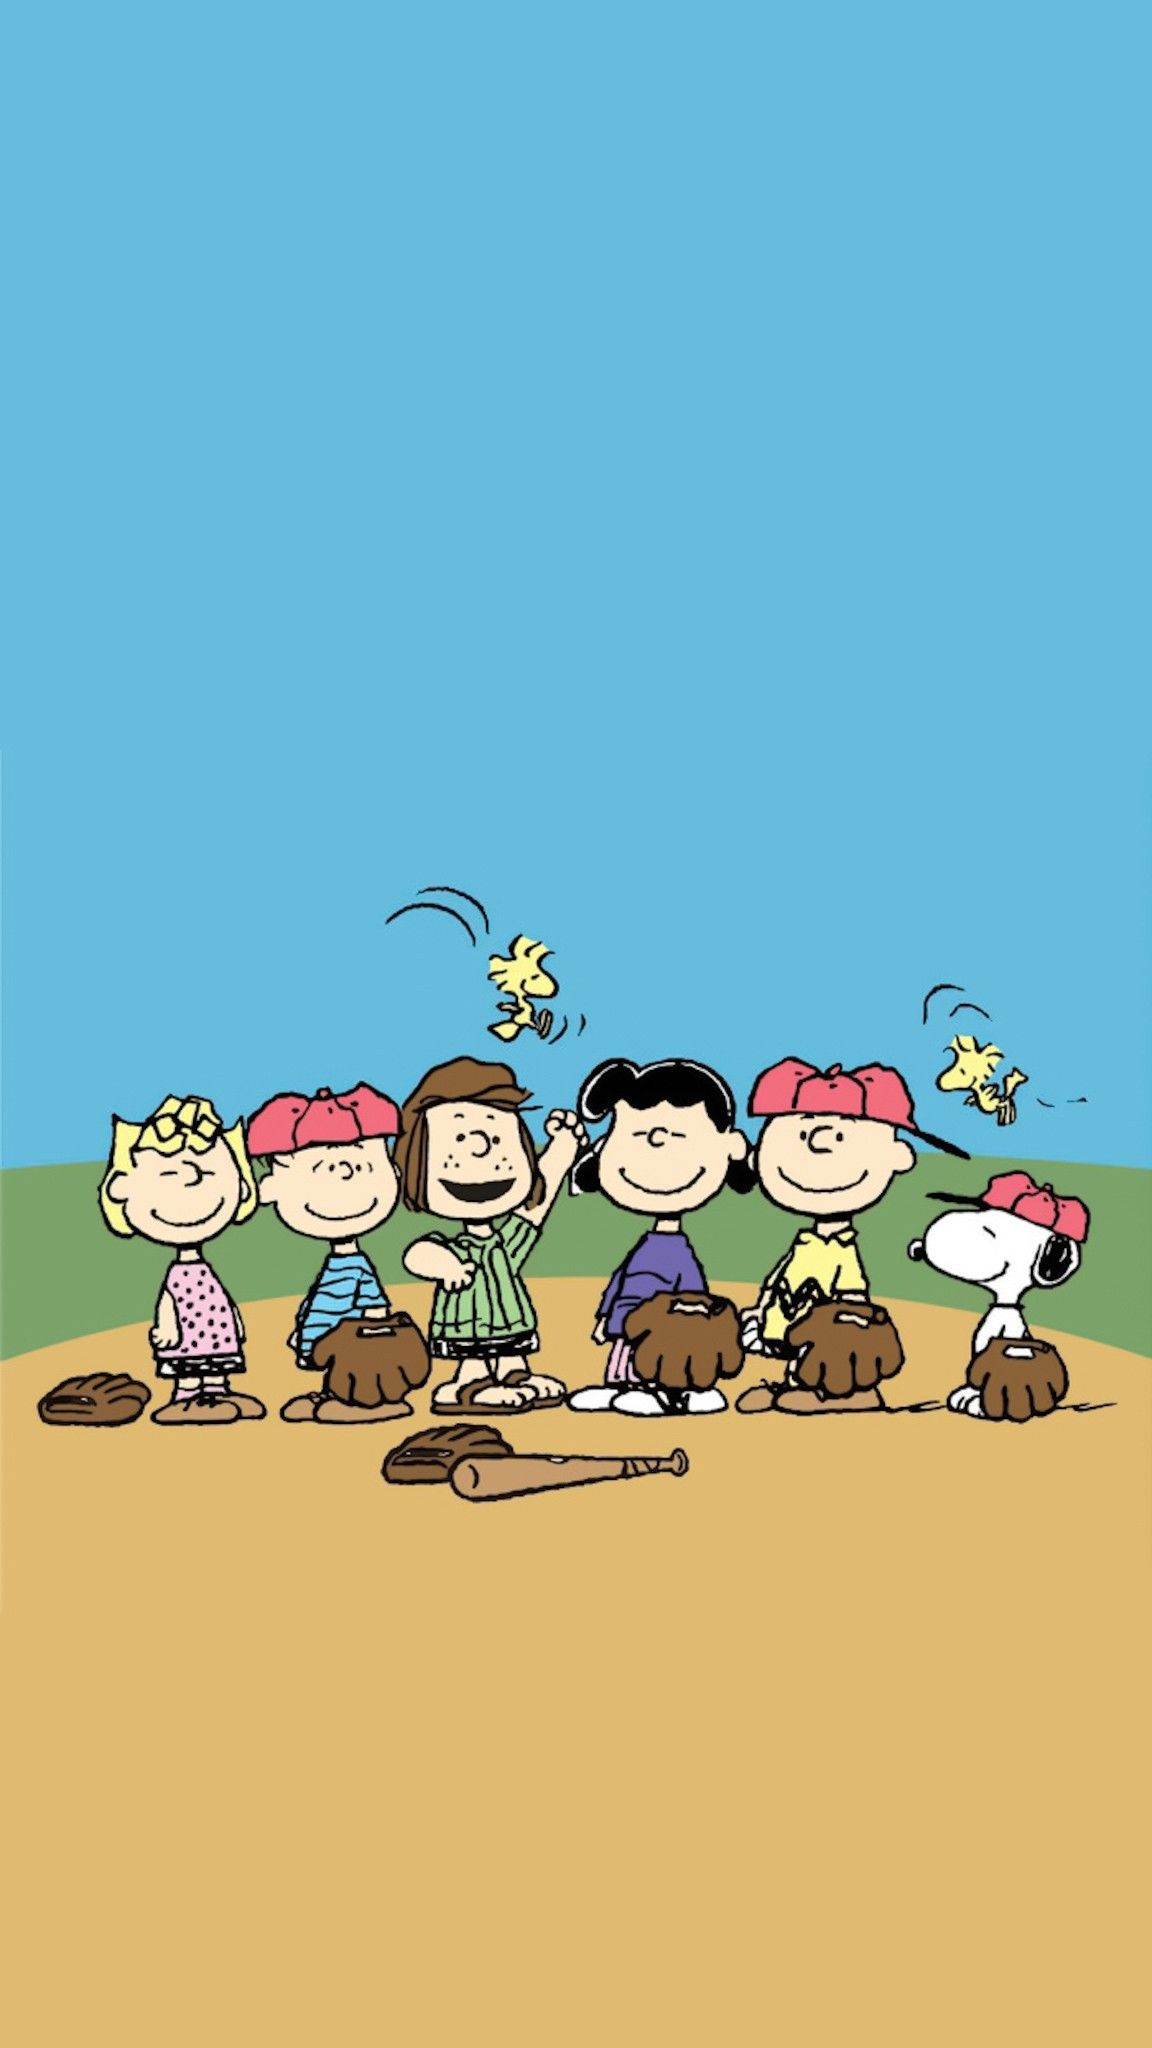 Snoopy wallpaper, Peanuts wallpaper ...